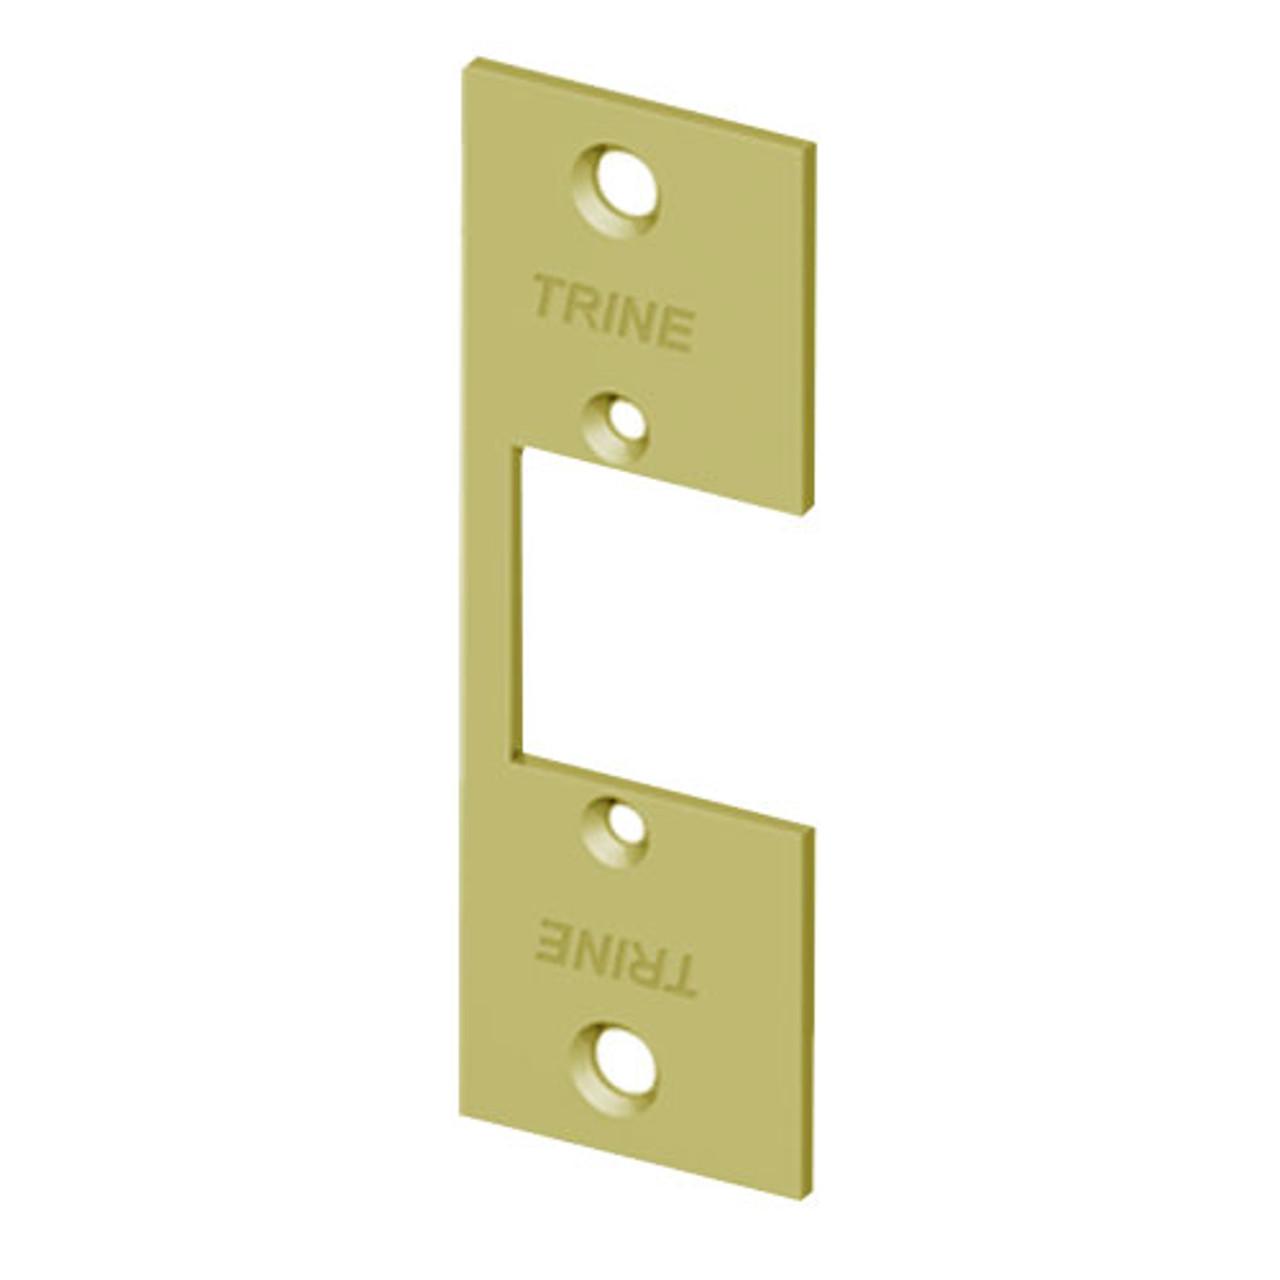 334-US4 Trine 3000 Series Faceplate in Satin Brass Finish